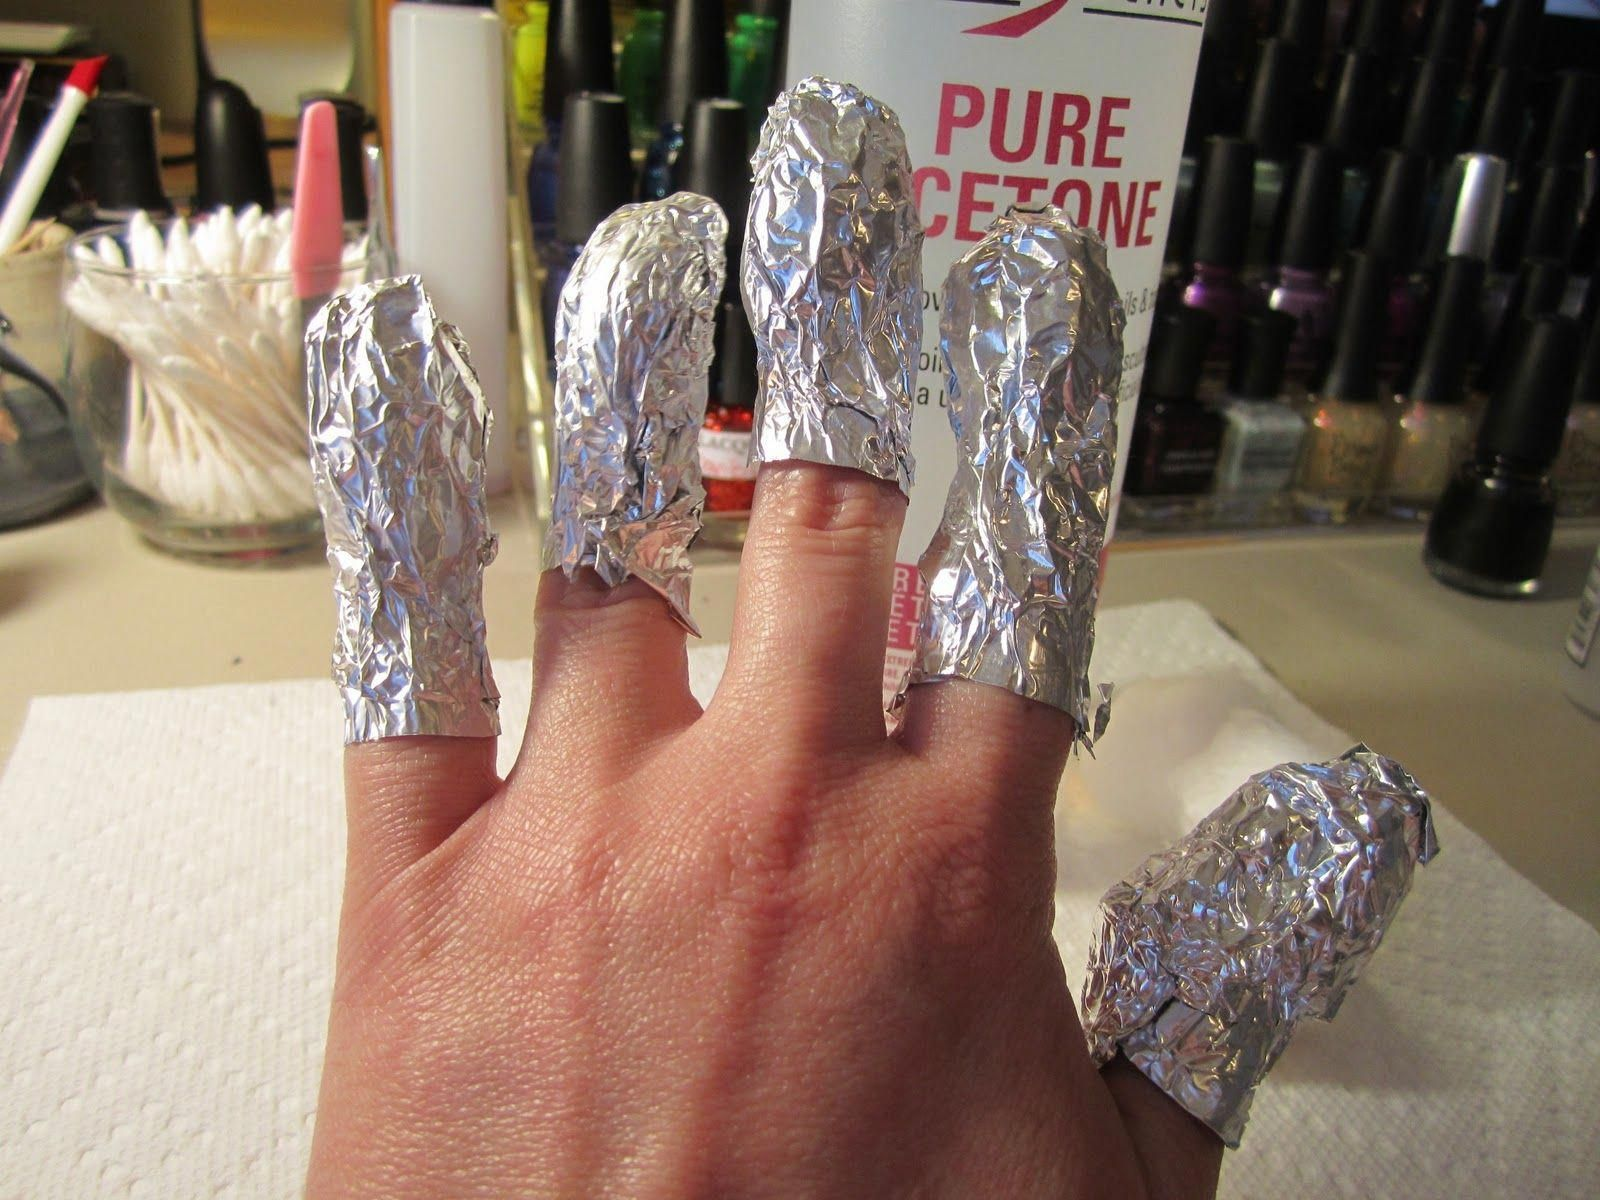 Remove Acrylic Nails Or Nail Polish With Cotton Balls Dipped In Nail Polish Remover And Then Remove Acrylic Nails Take Off Acrylic Nails Soak Off Acrylic Nails